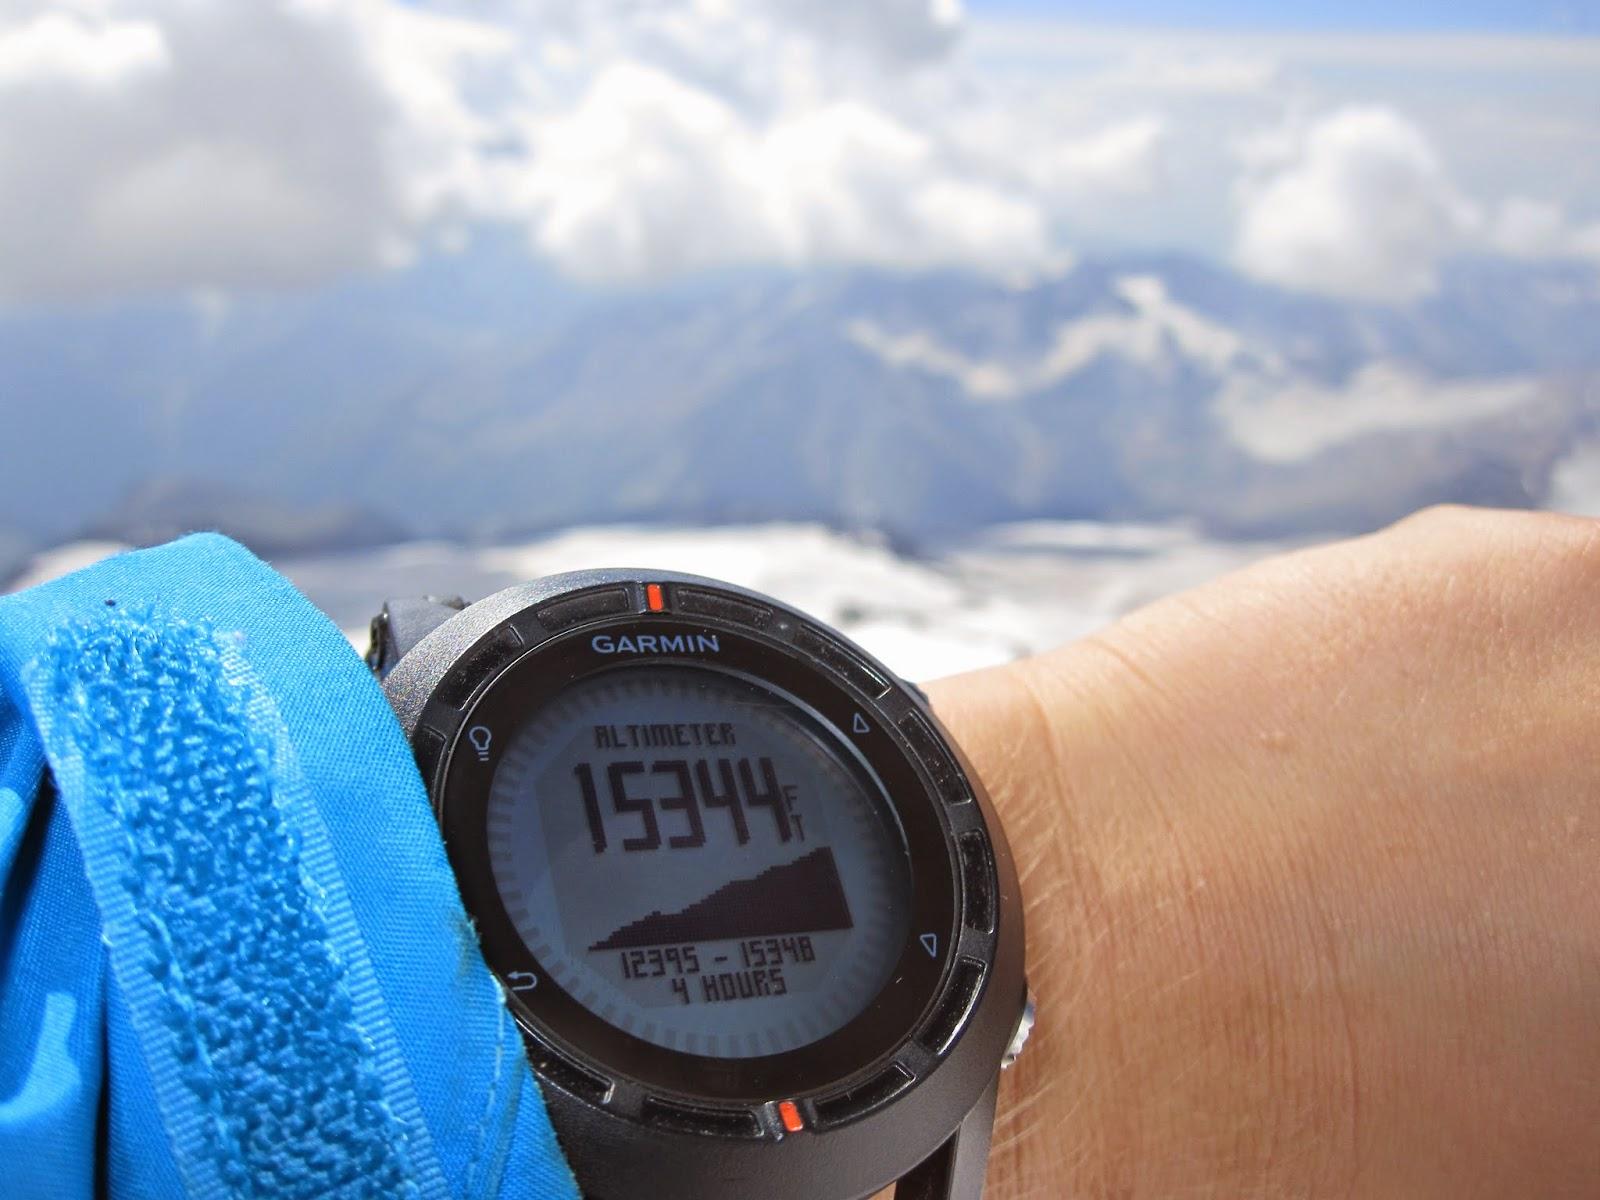 Garmin Fenix GPS watch altimeter